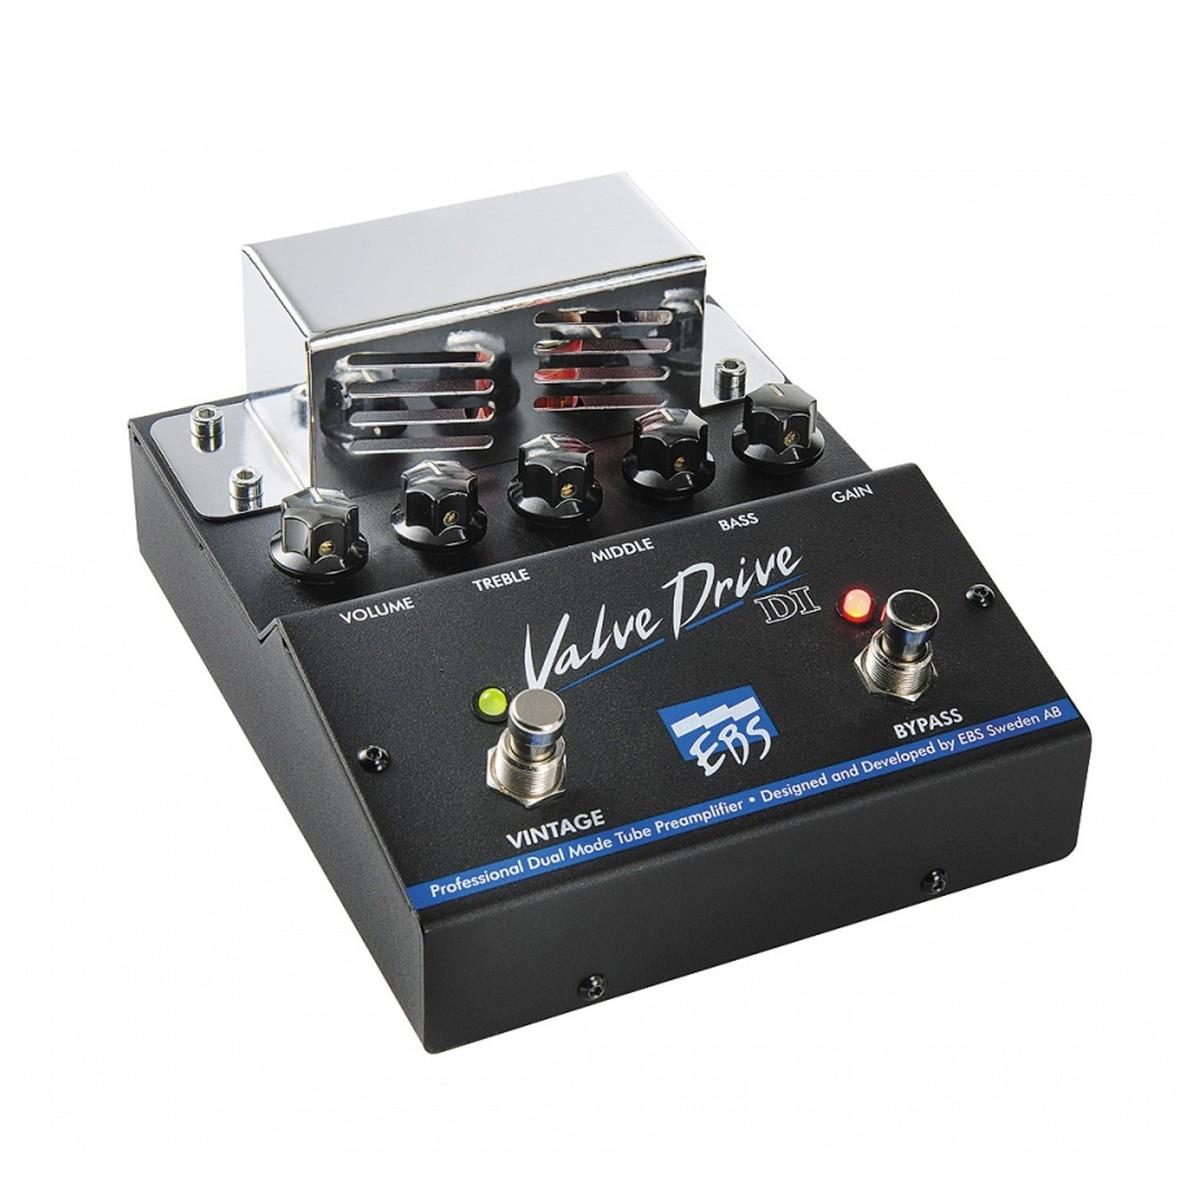 Bass Preamp Di : ebs valve drive di professional bass tube preamp at gear4music ~ Hamham.info Haus und Dekorationen